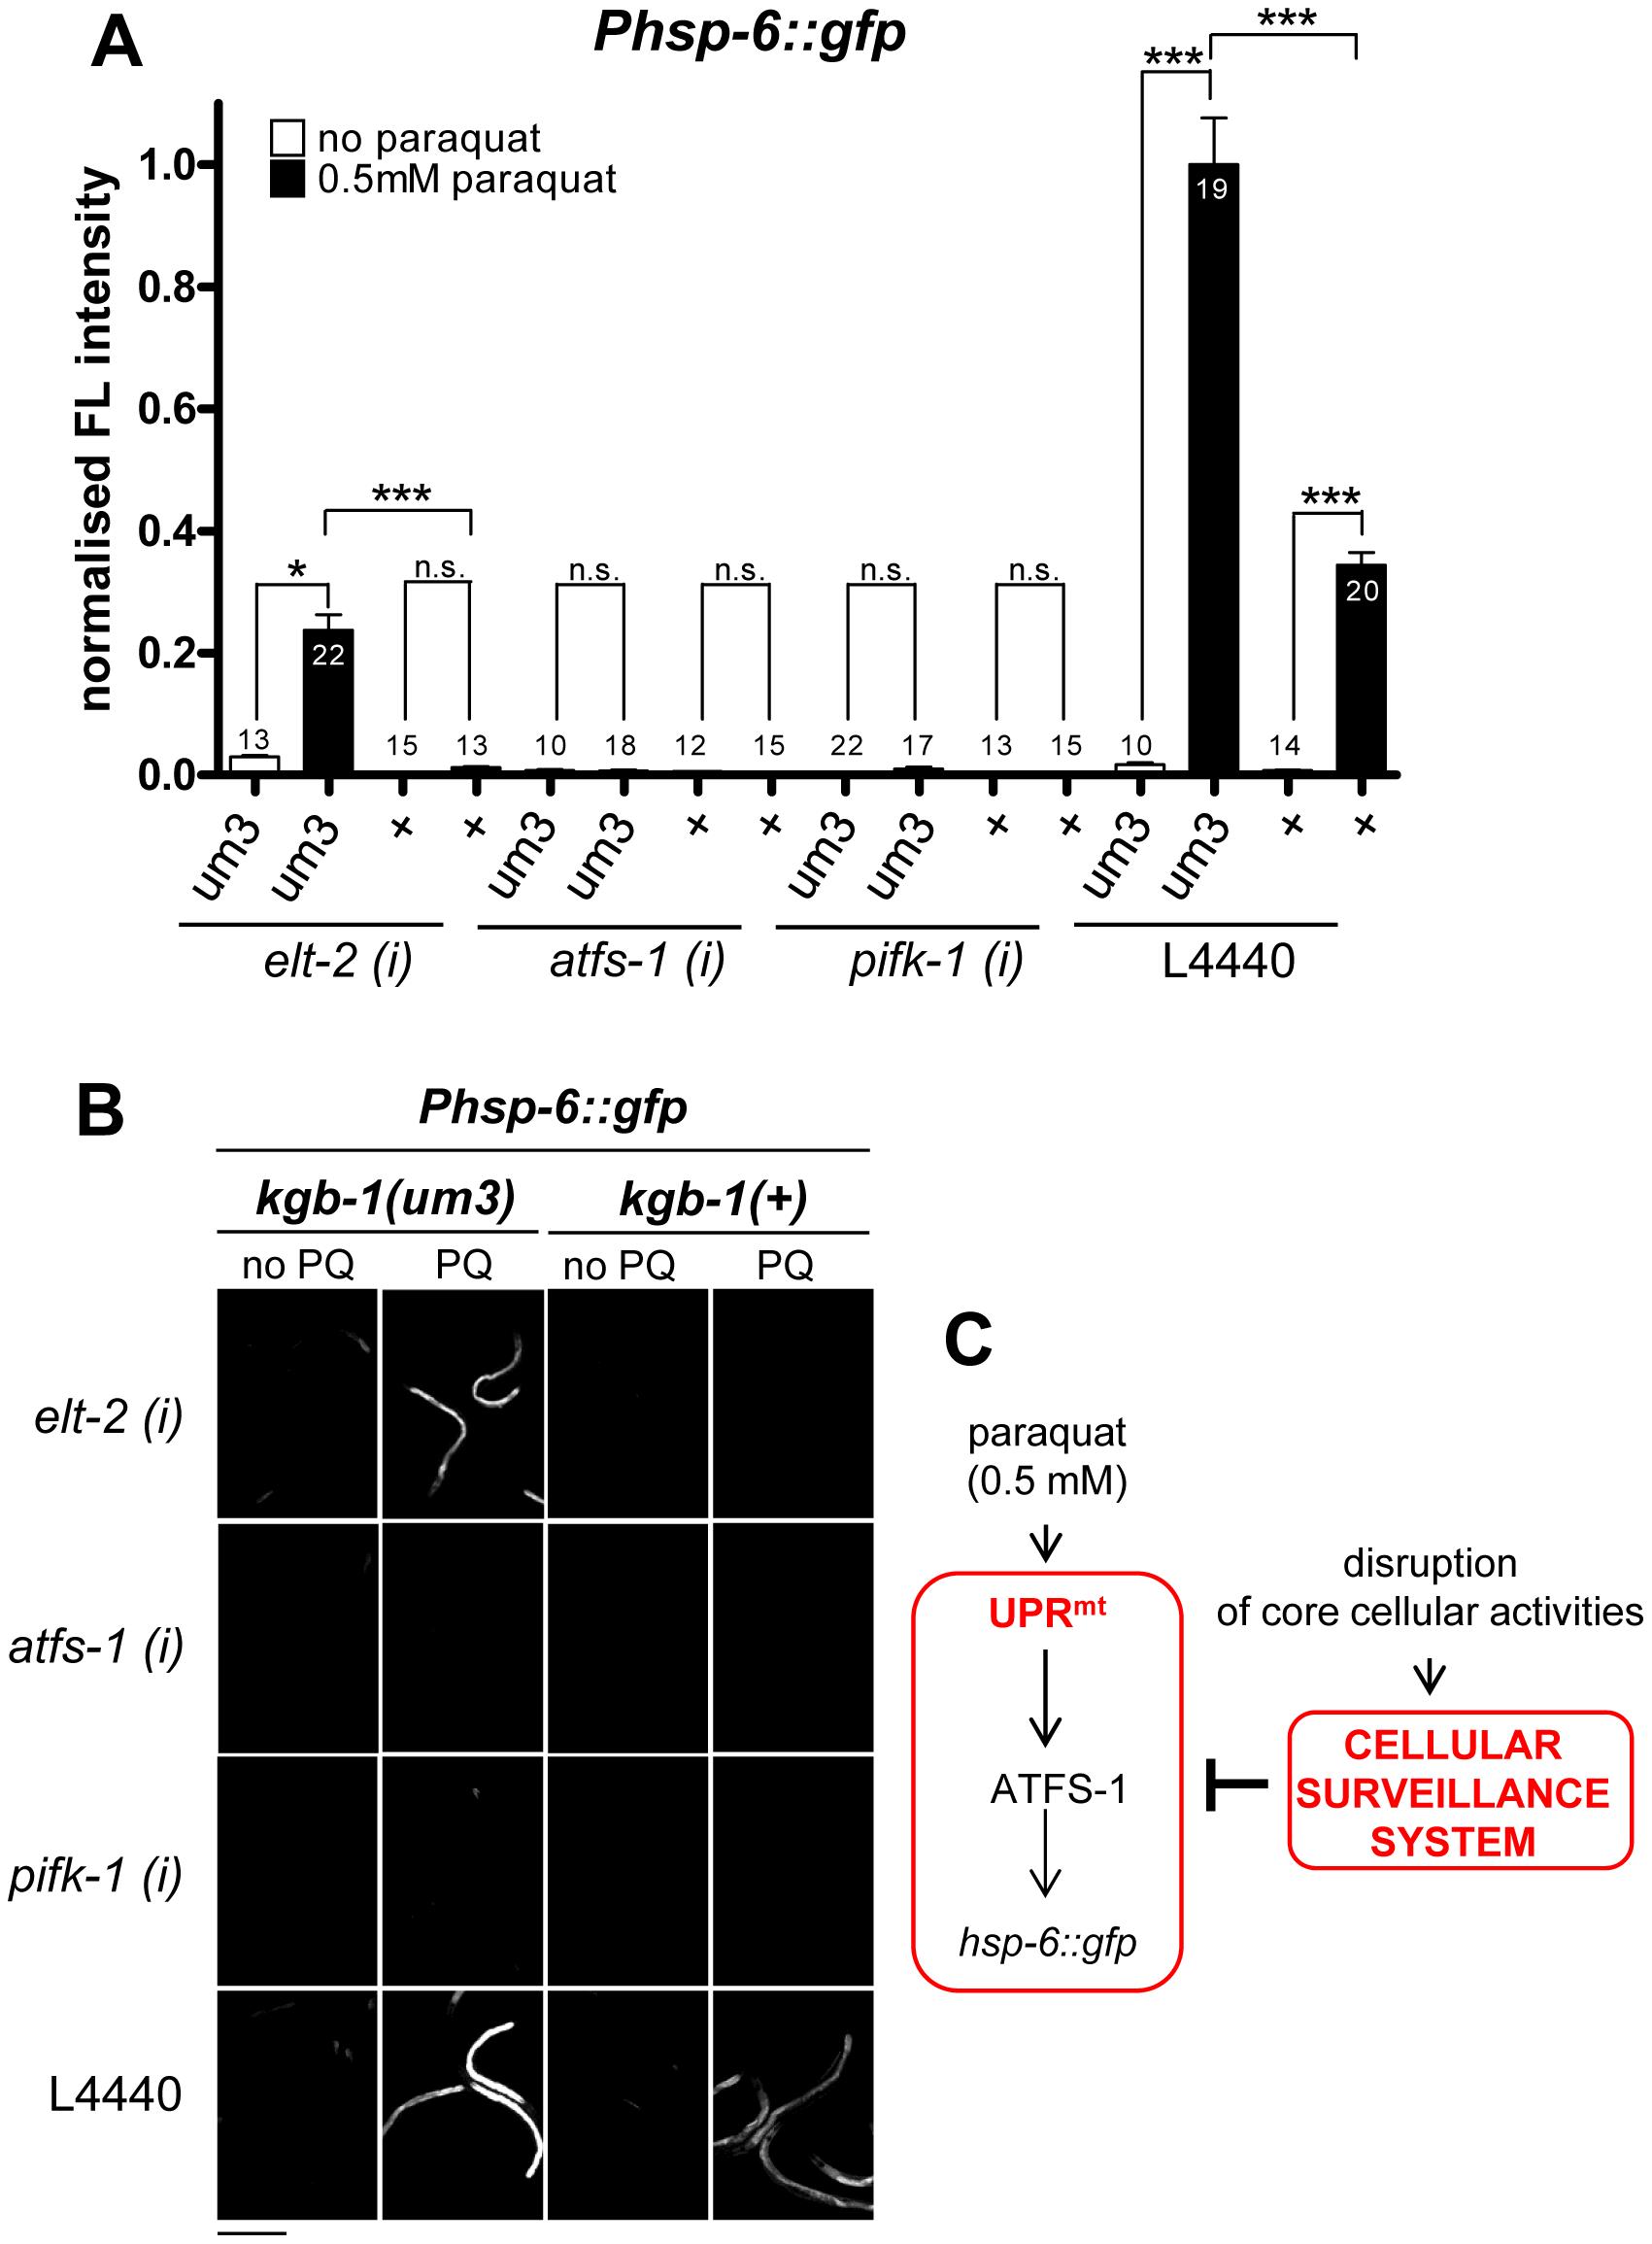 cSADDs inhibits paraquat-mediated signaling to <i>hsp-6</i> through KGB-1.